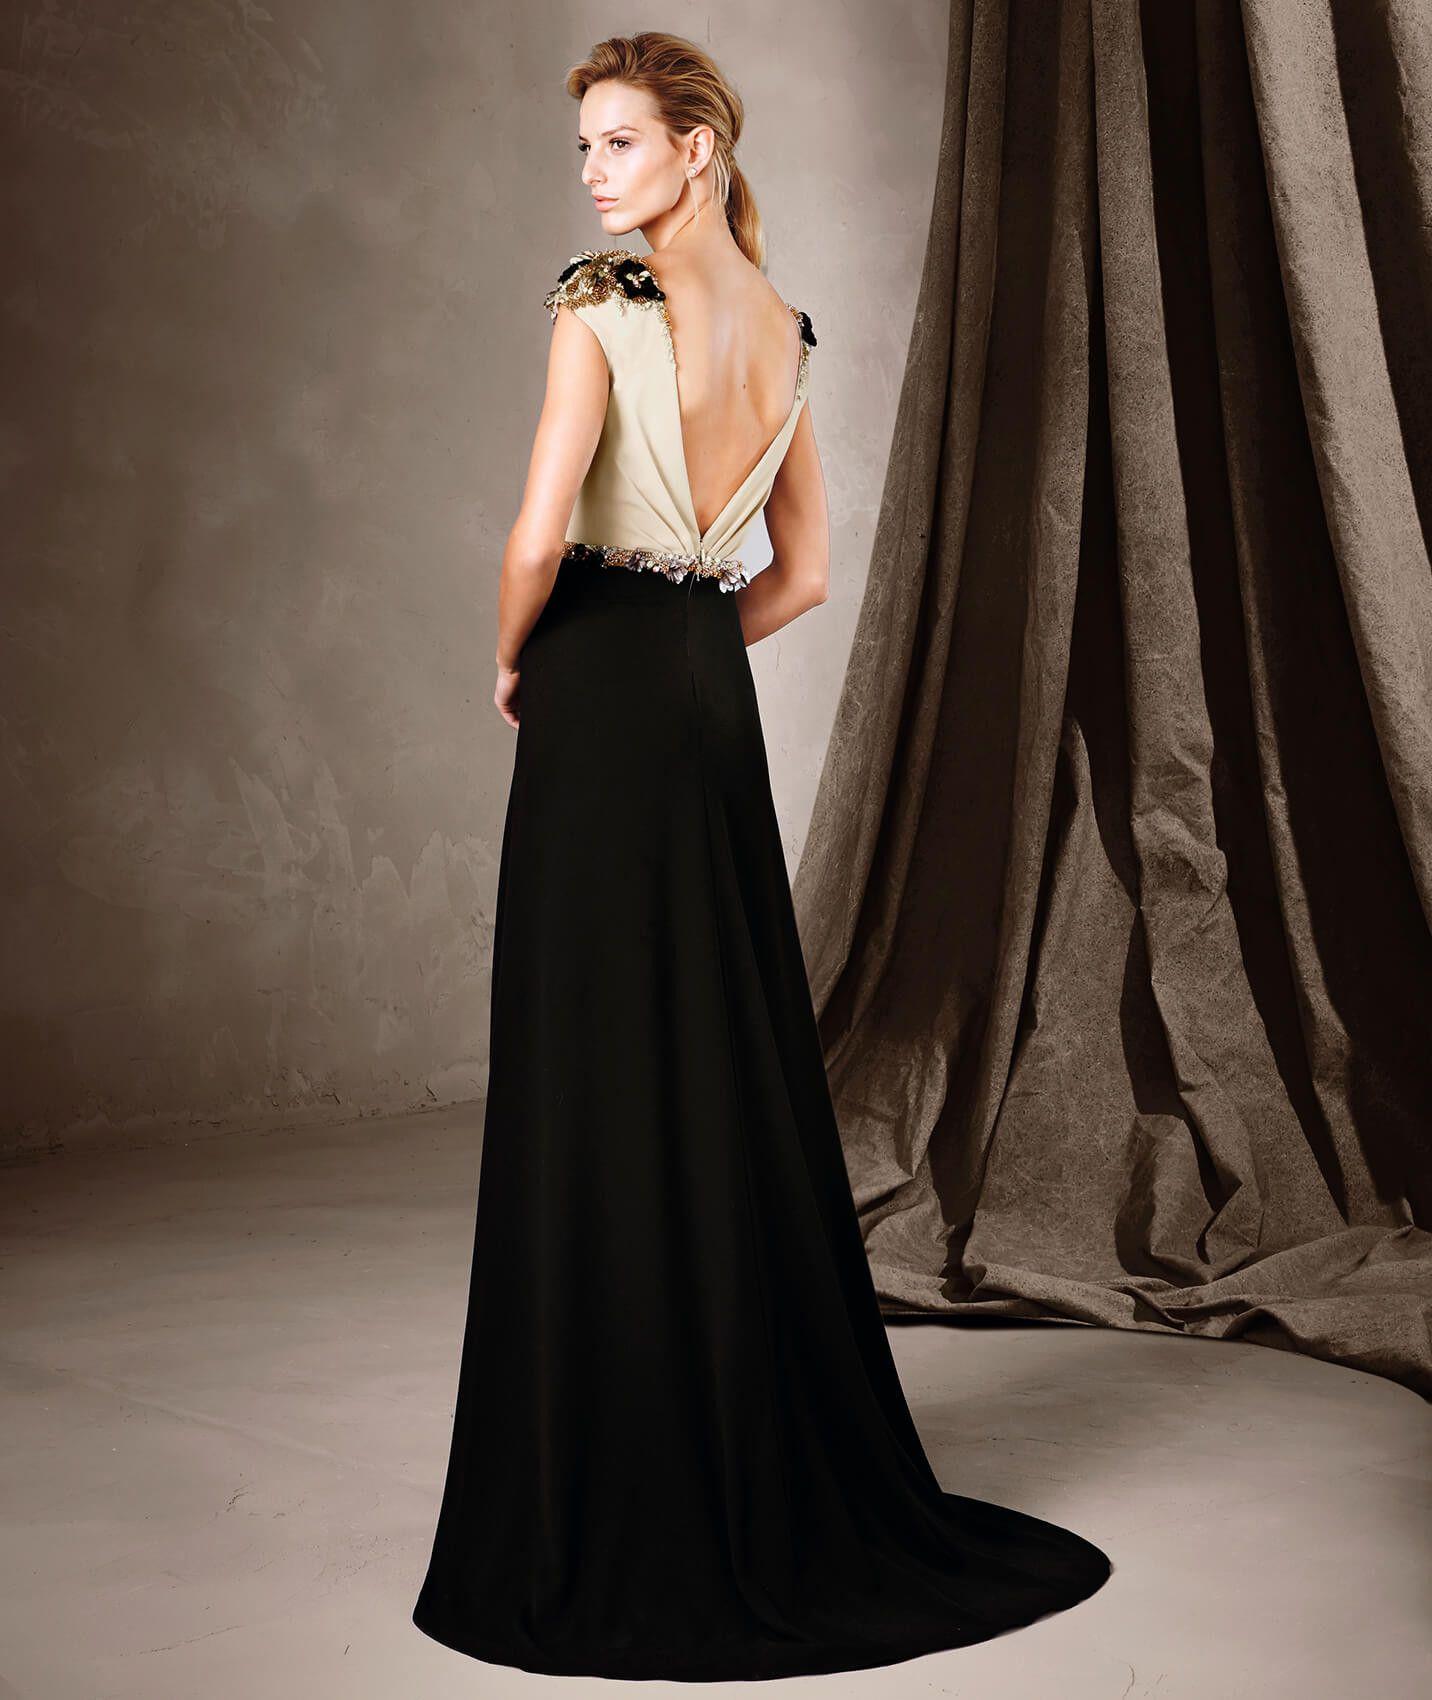 CLARA - Vestido bicolor Pronovias   Out fit   Pinterest